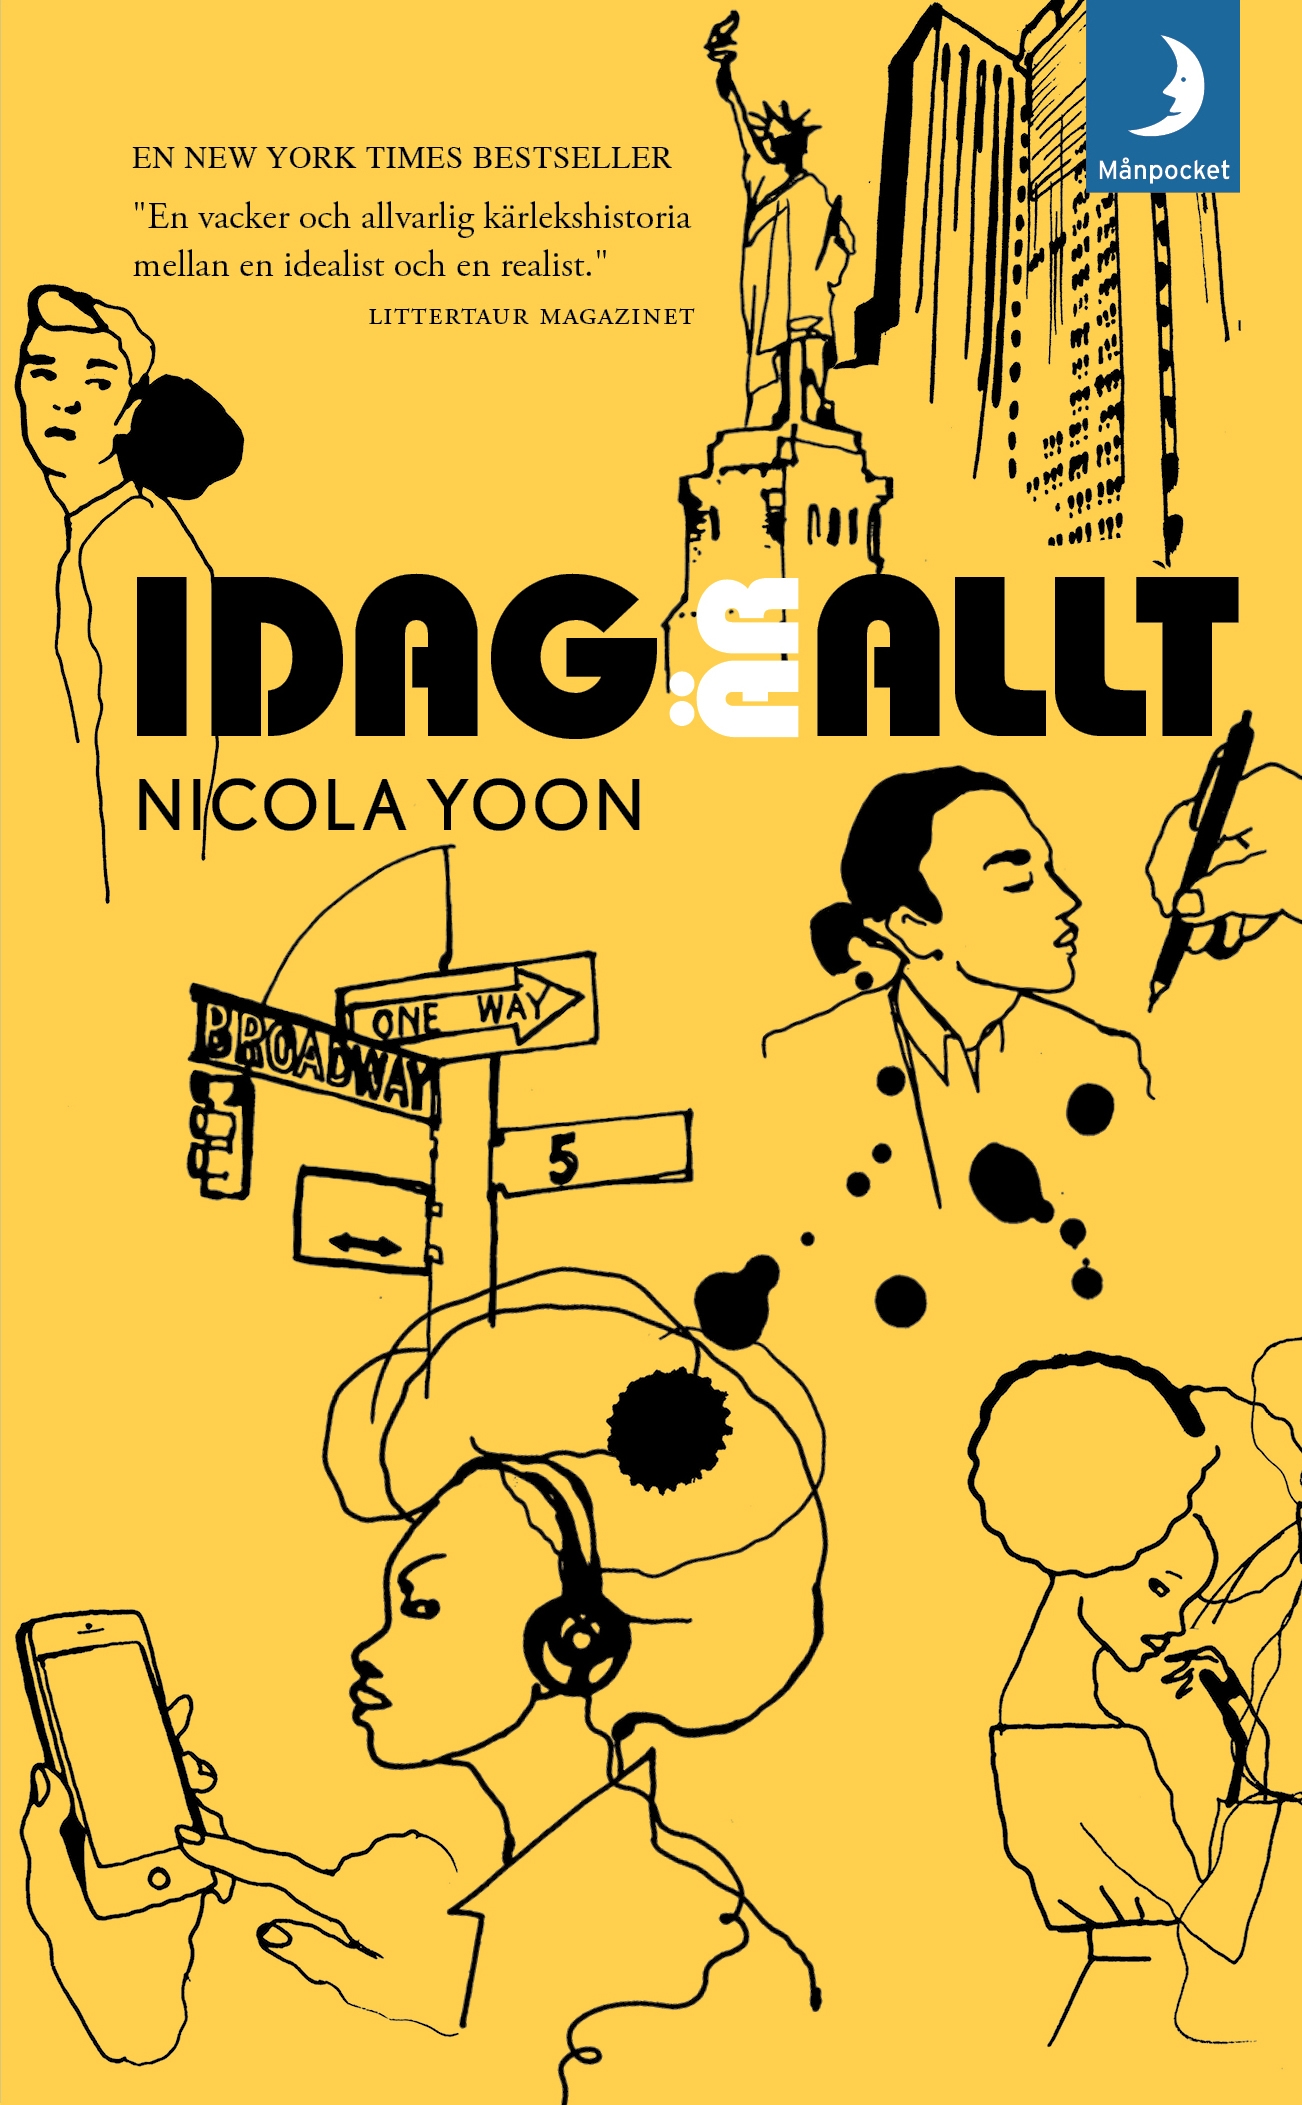 Idag är allt by Nicola Yoon